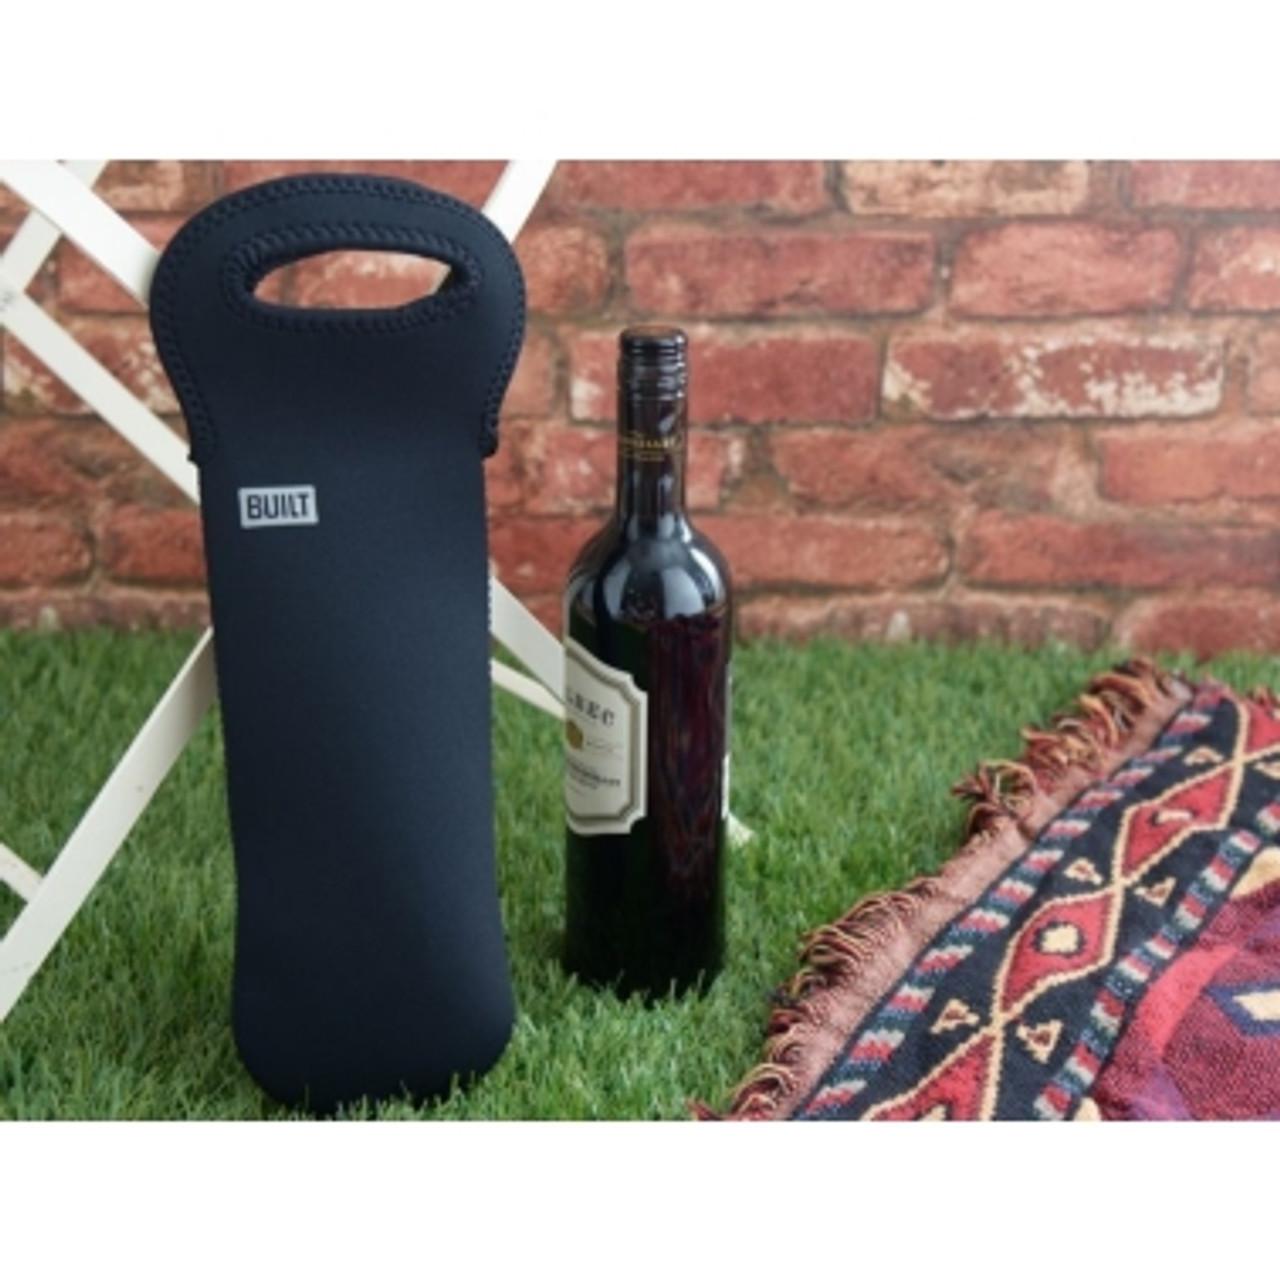 Built One Bottle Wine Tote Black